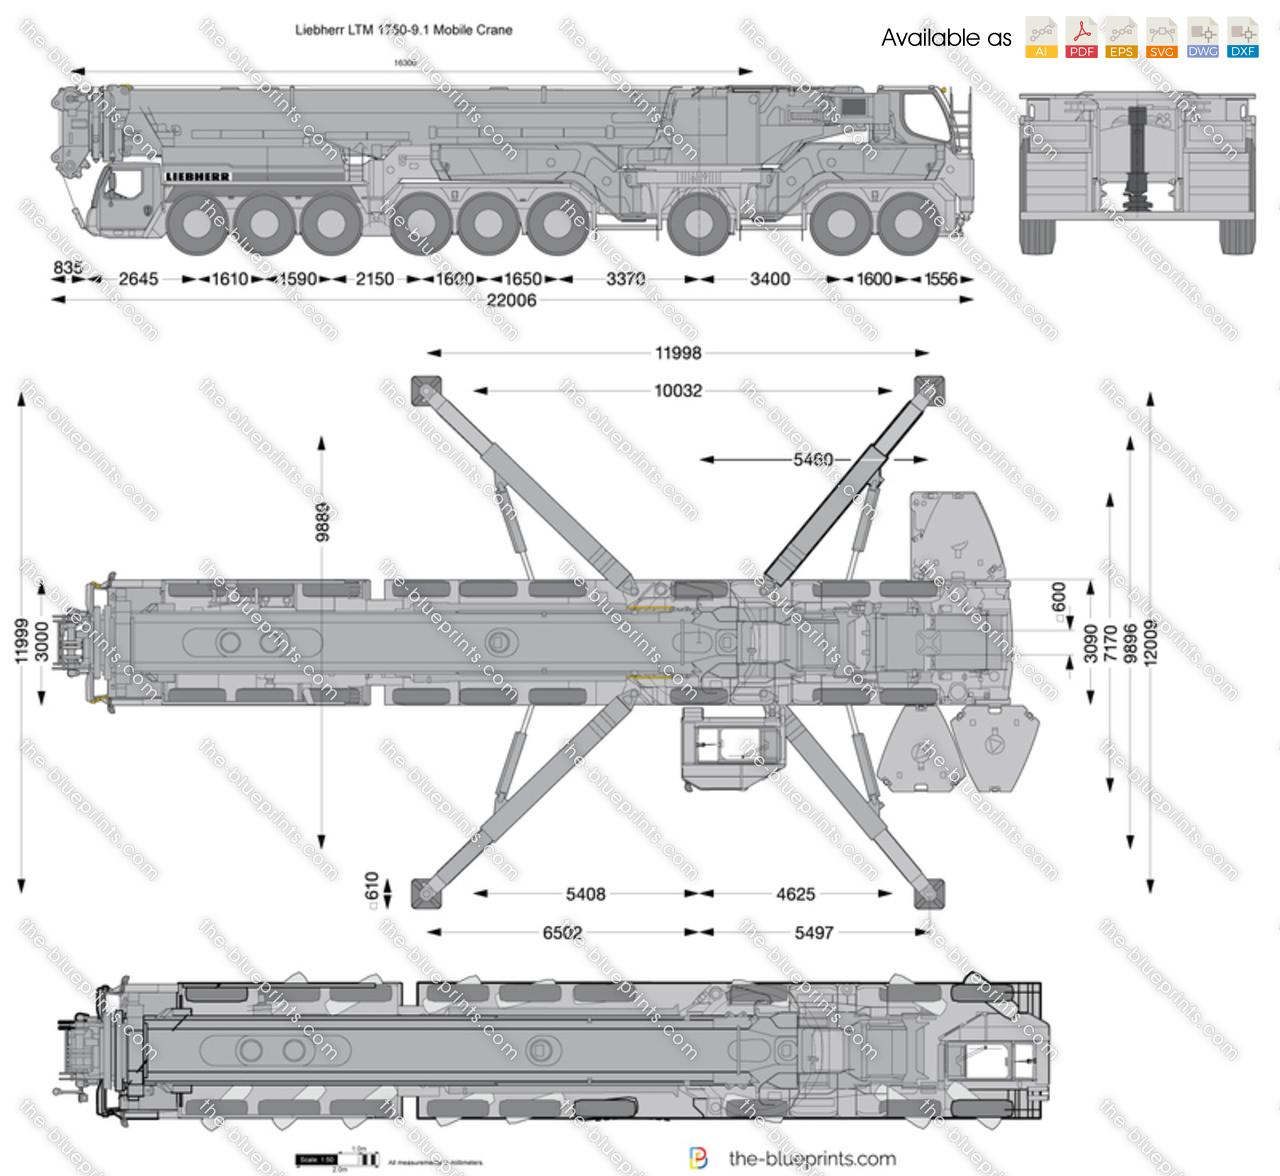 Liebherr LTM 1750-9.1 Mobile Crane